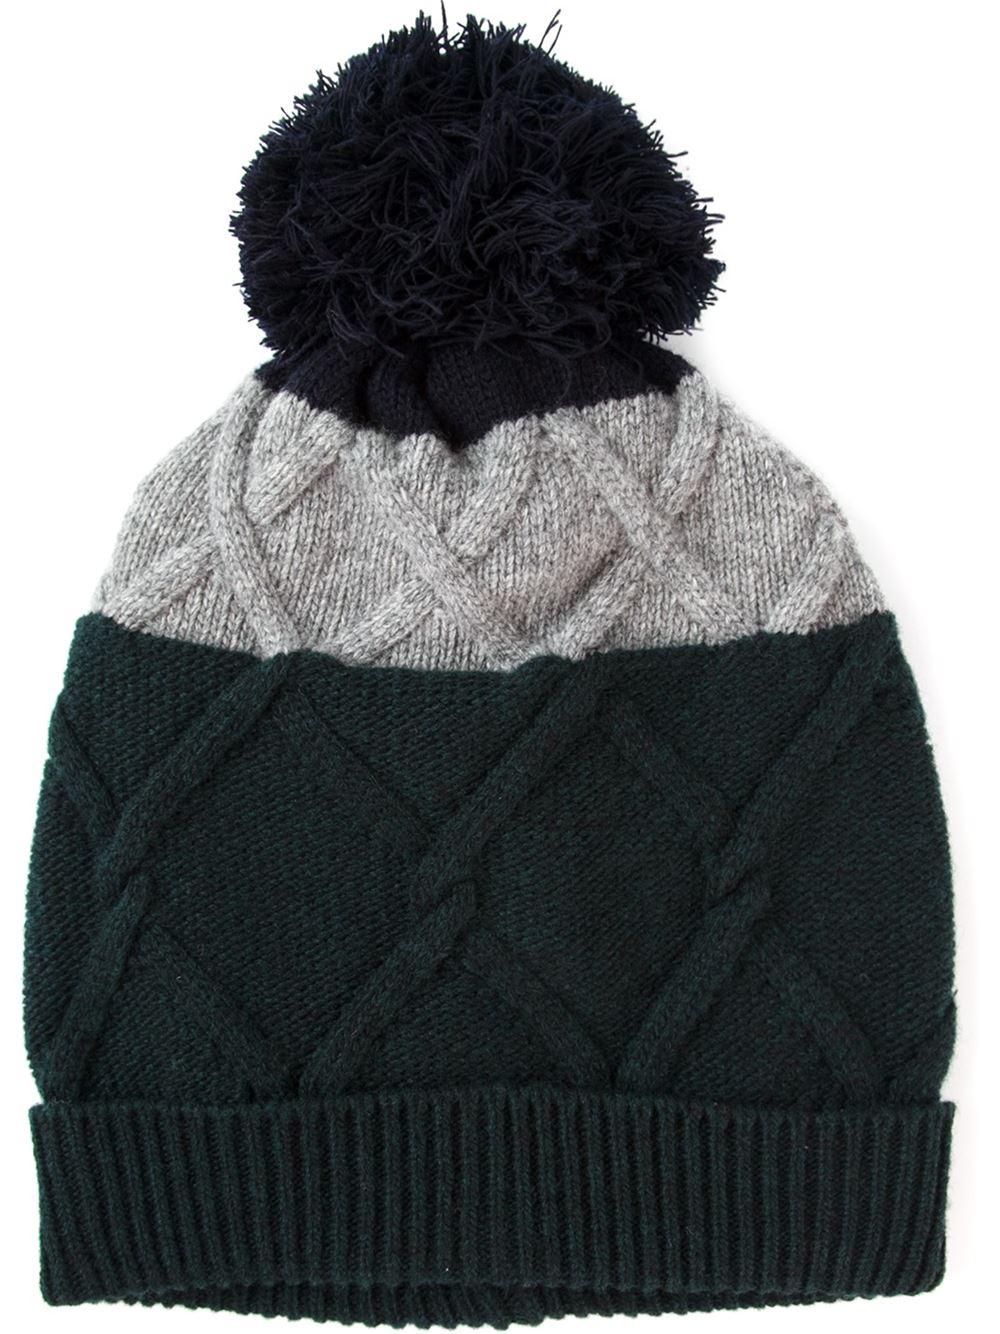 Lyst - Moncler Slouch Beanie Hat in Black for Men 5ef1fb9e419